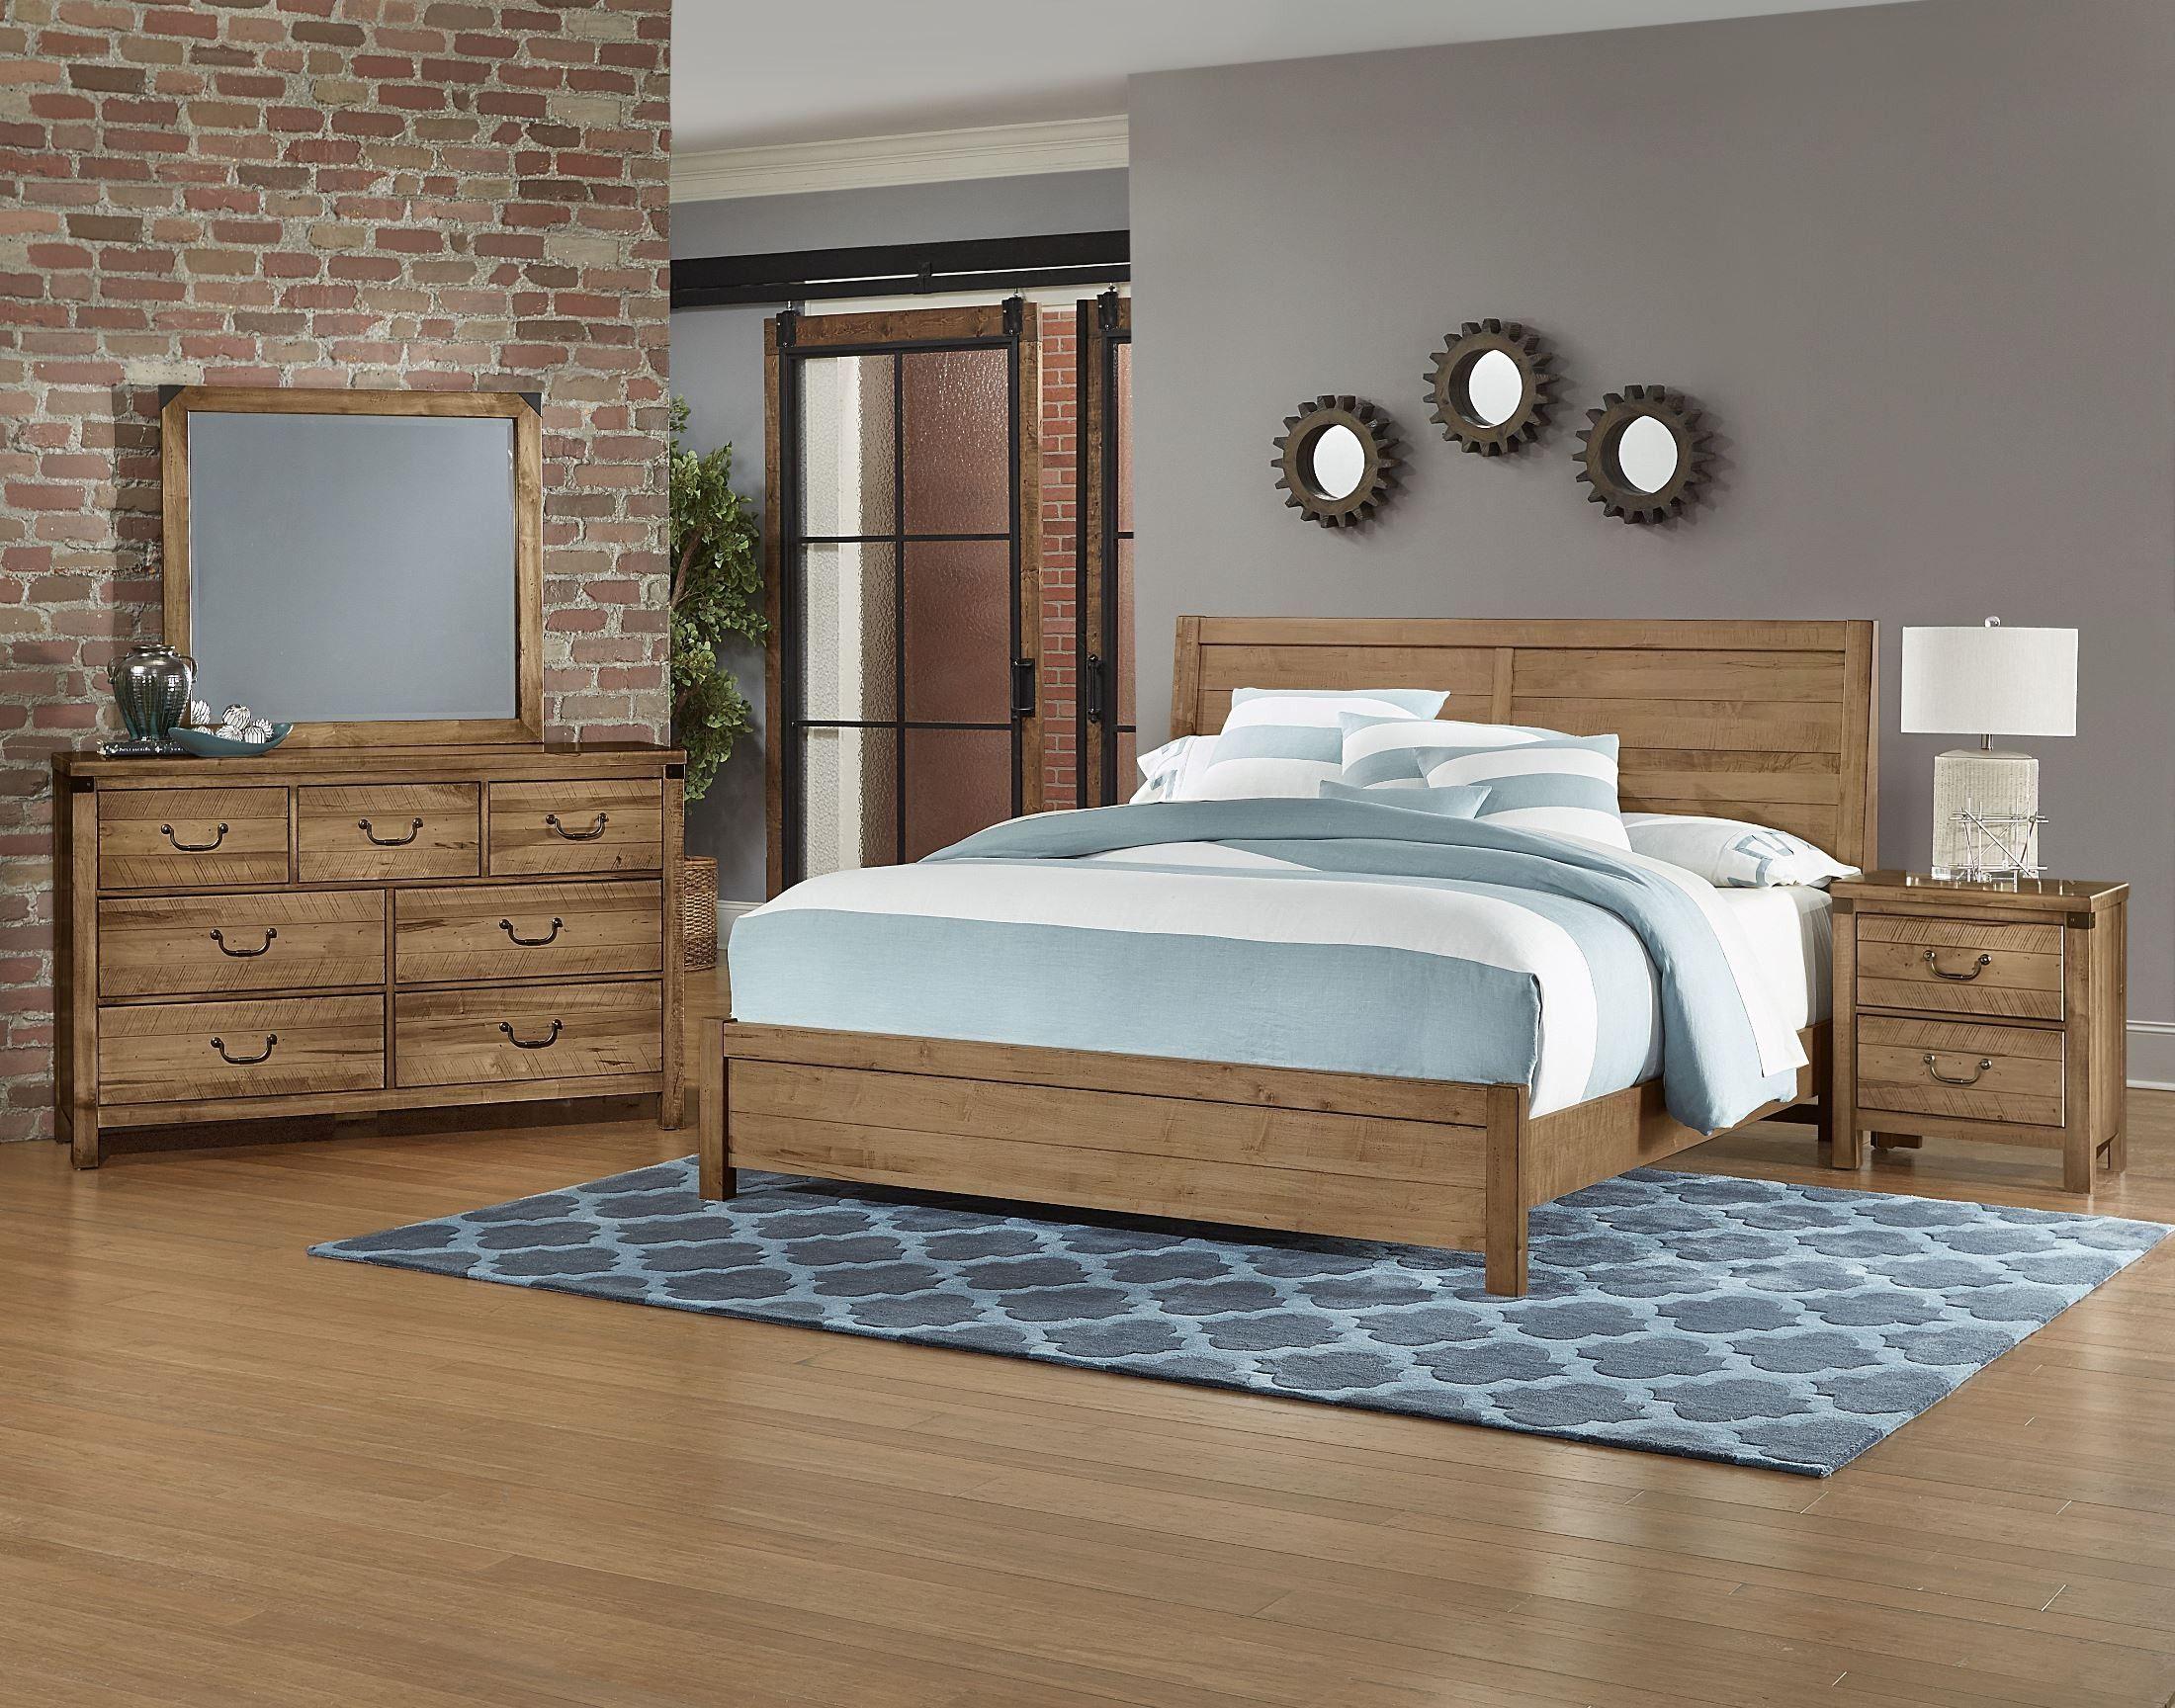 Sedgwick Natural Maple Plank Bedroom Set Bedroom set